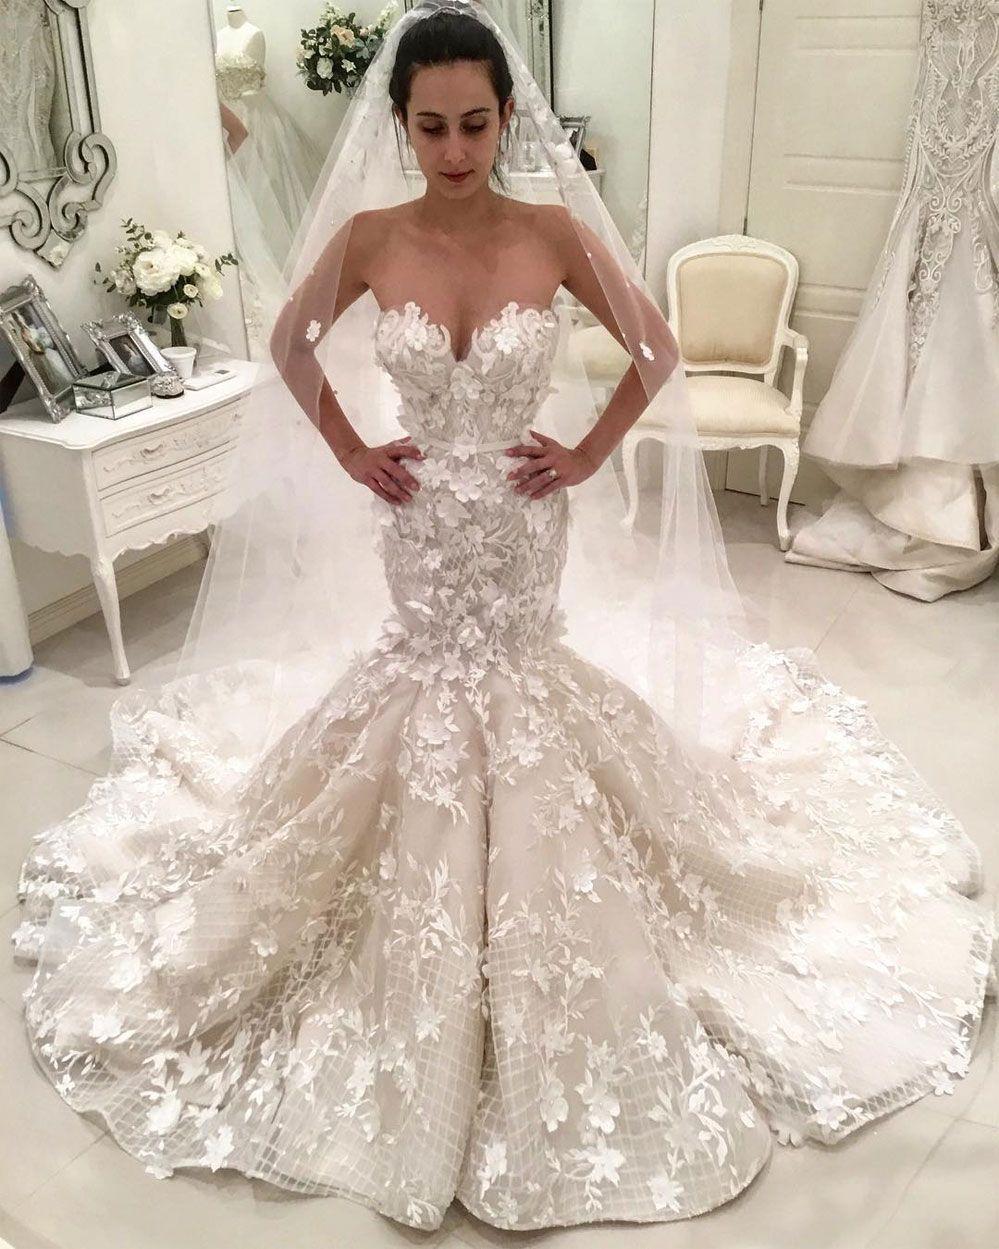 94b9a42c24ce Sweetheart neckline heavy embellishment 3d floral applique mermaid wedding  dress #weddingdress #weddinggown #wedding #bridedress